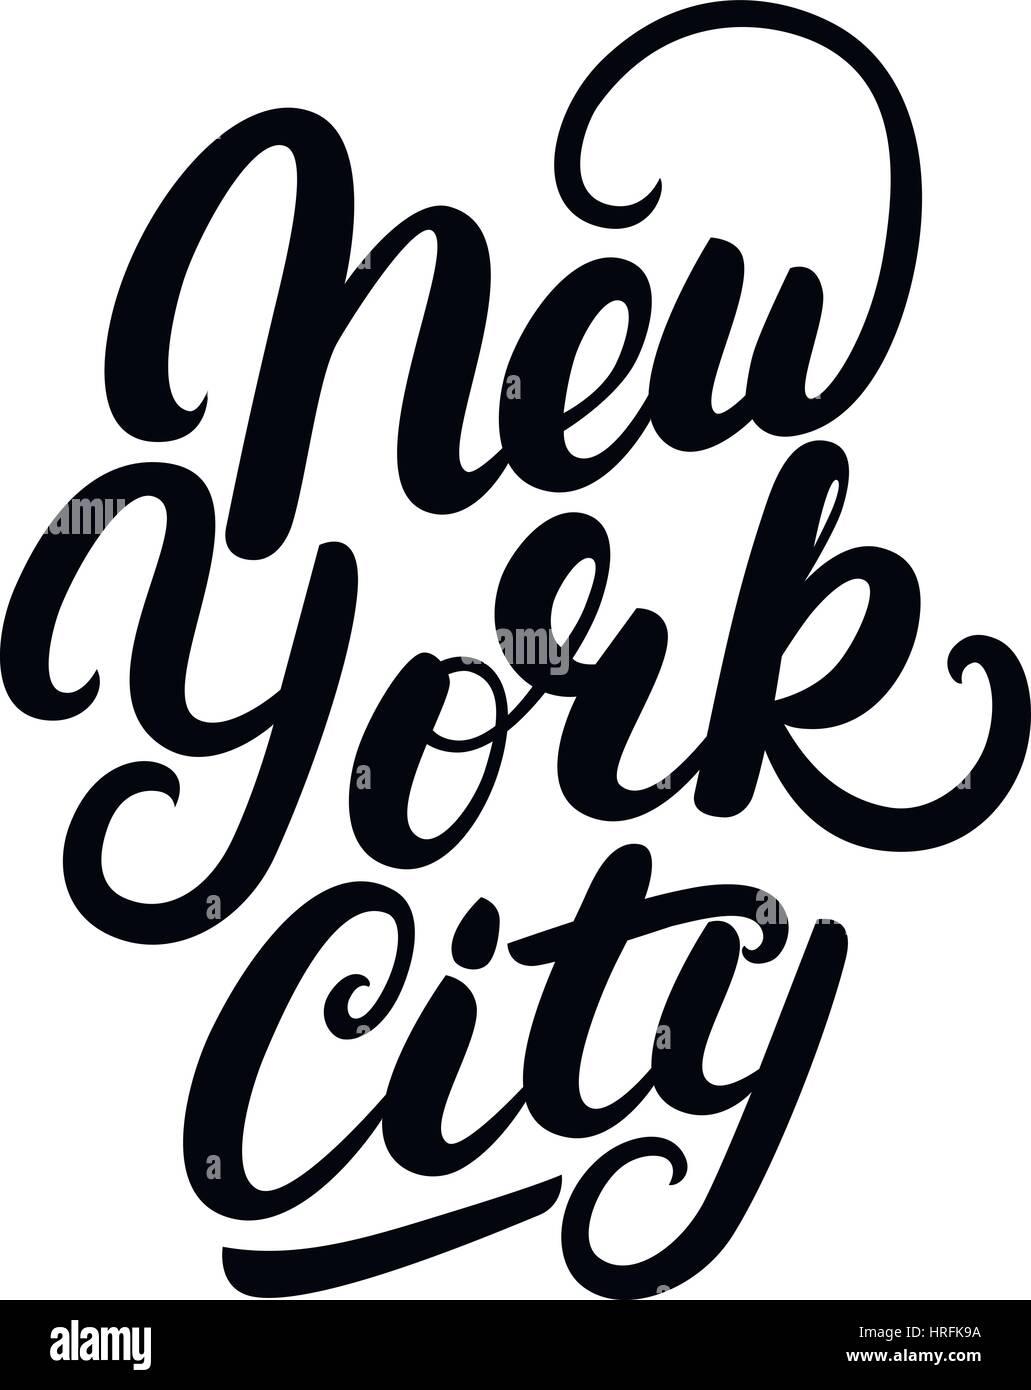 7d04ecce New York City hand written lettering. Modern brush calligraphy. Tee print  apparel fashion design. Hand crafted wall decor art poster. Vector illistrat